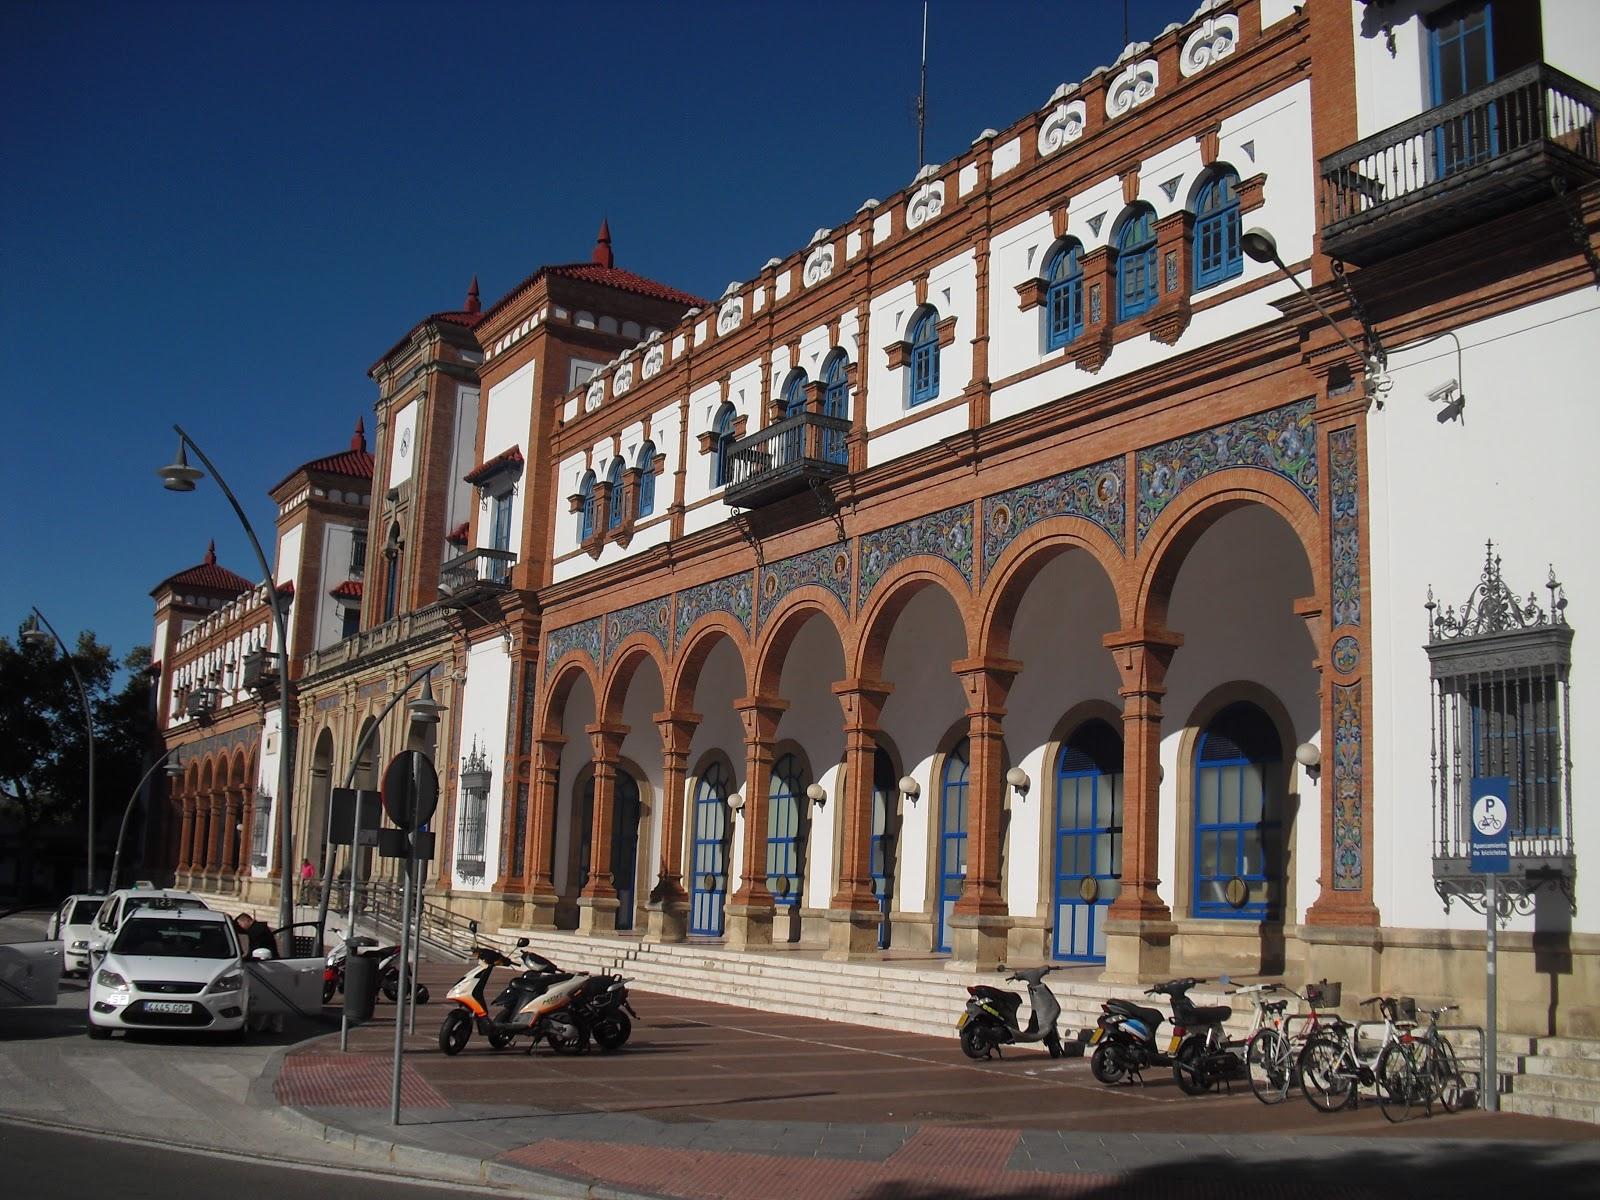 Club ferroviario jerezano estaci n de ferrocarril de jerez for Azulejos jerez de la frontera